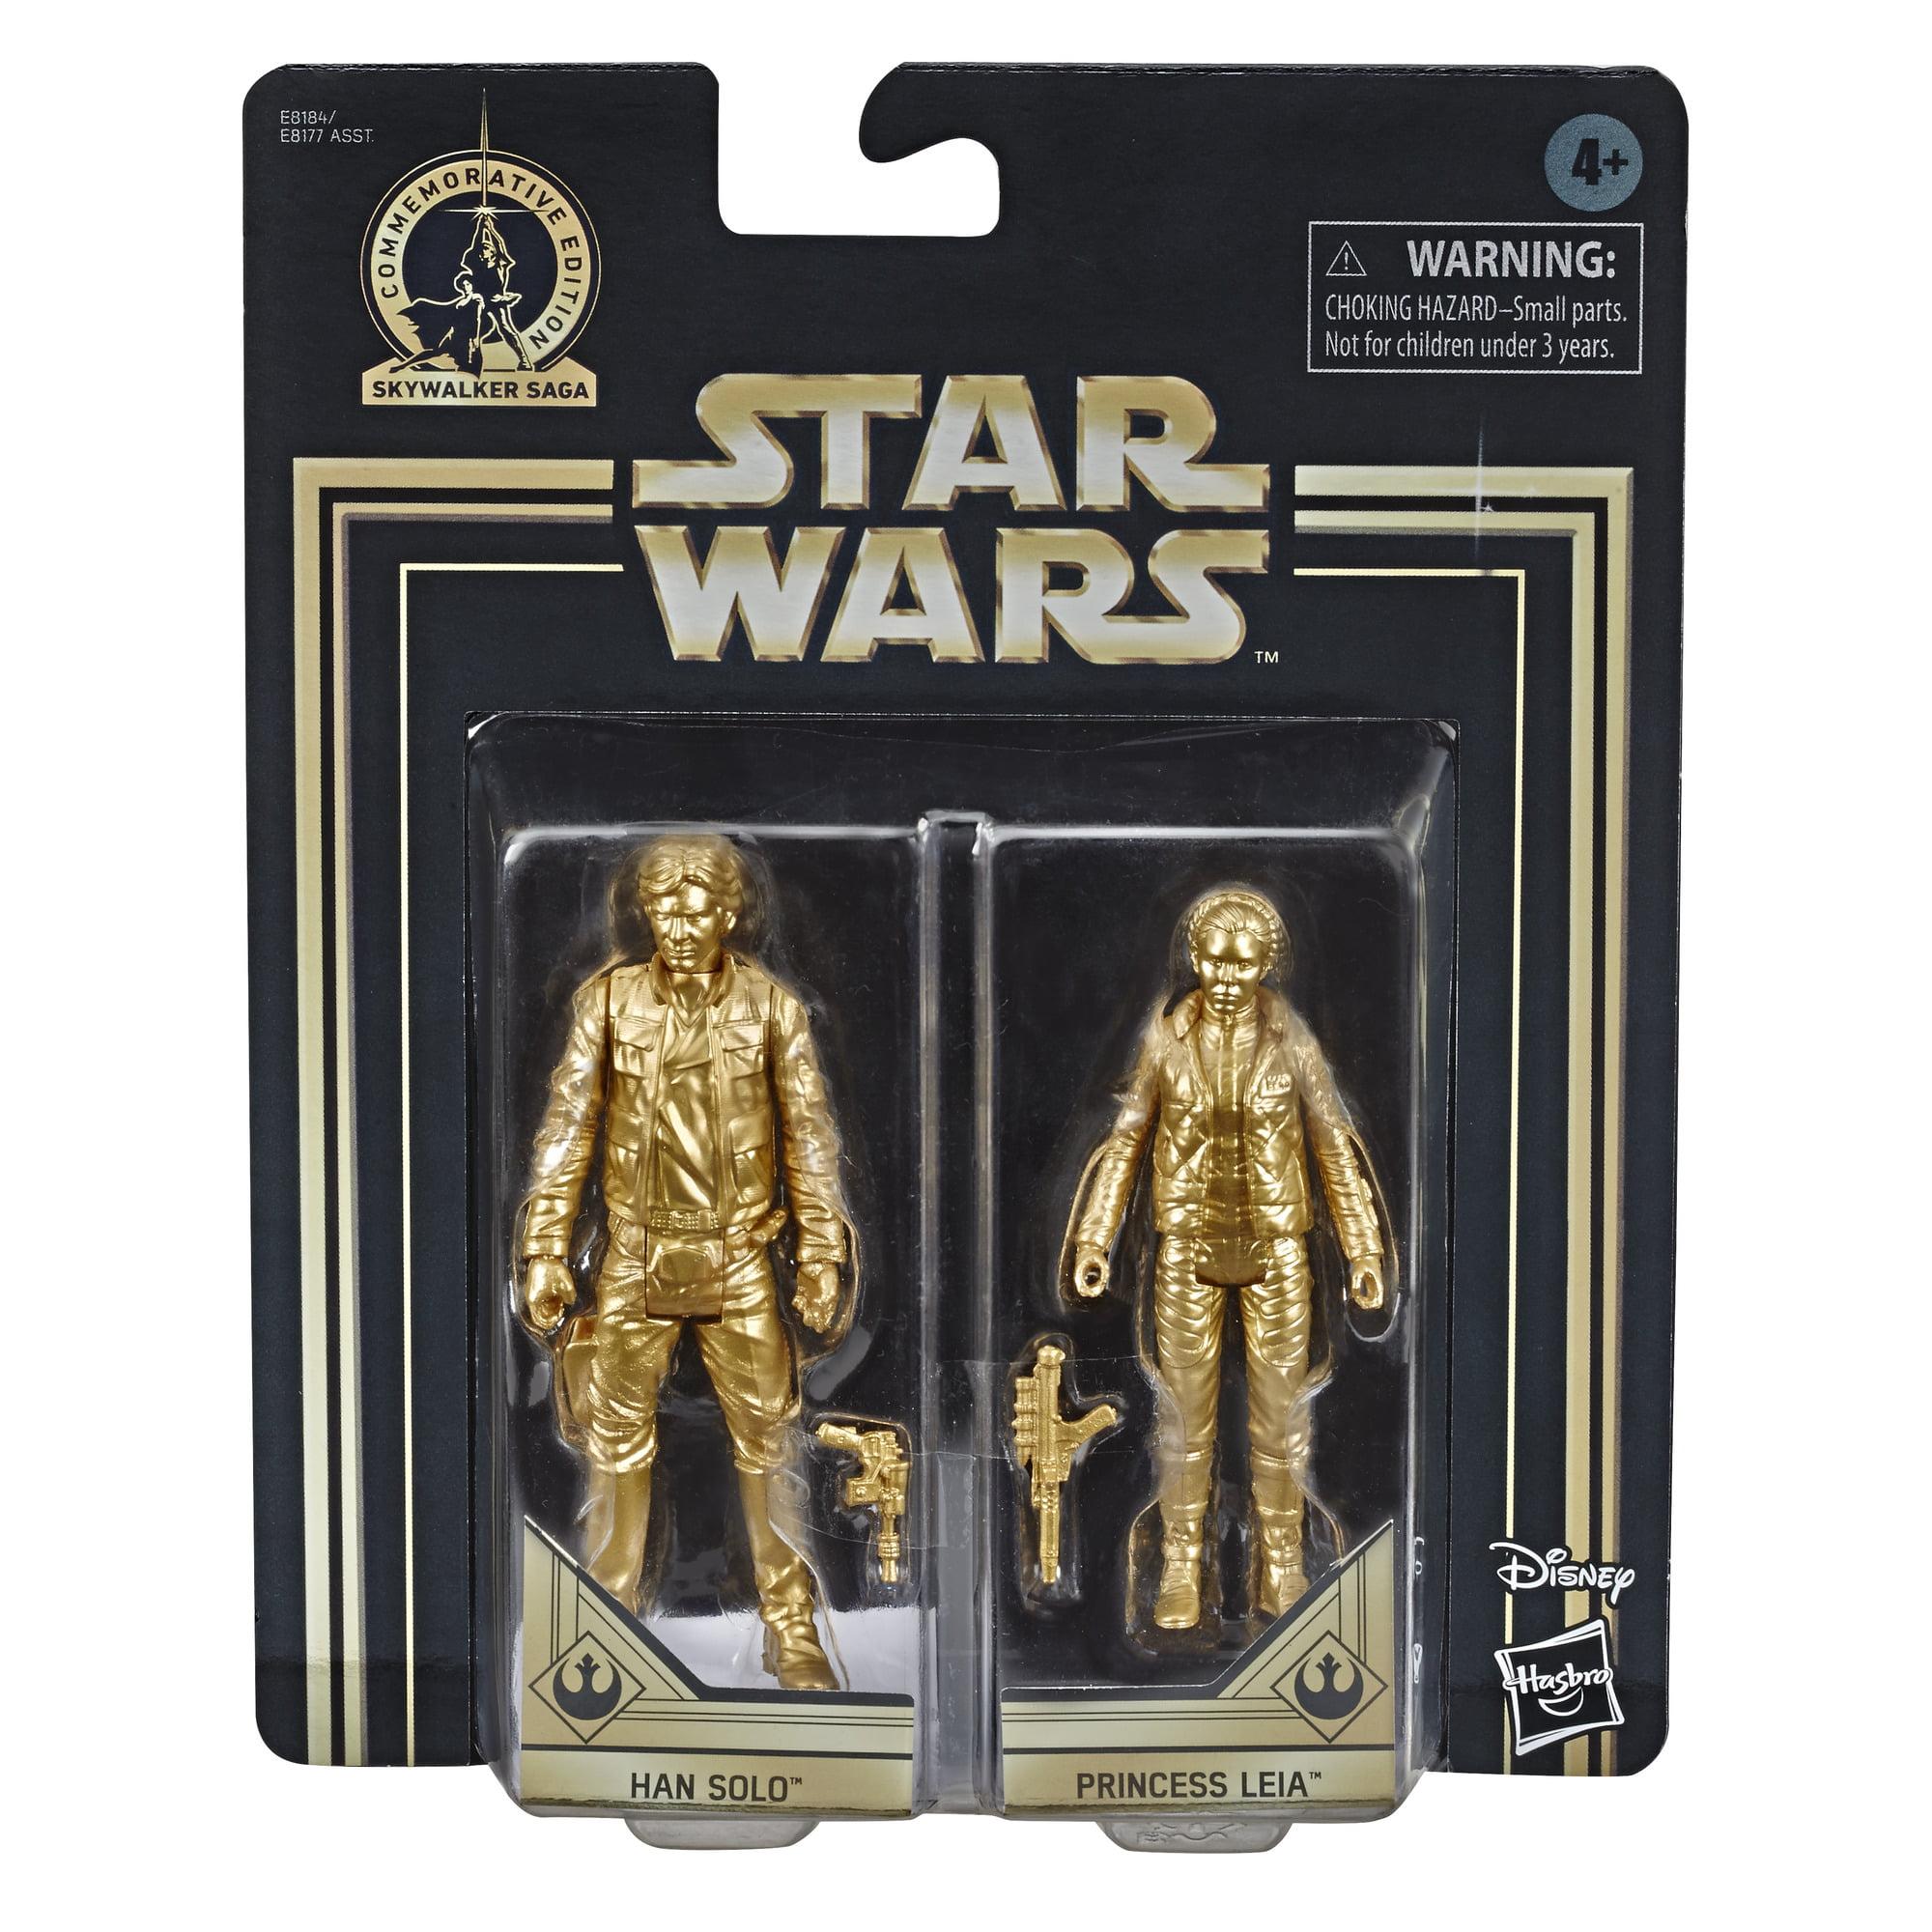 "Chewbacca Leia Kylo Ren /& Others Star Wars-Walmart Exclusive 3.75/"" Han Solo"